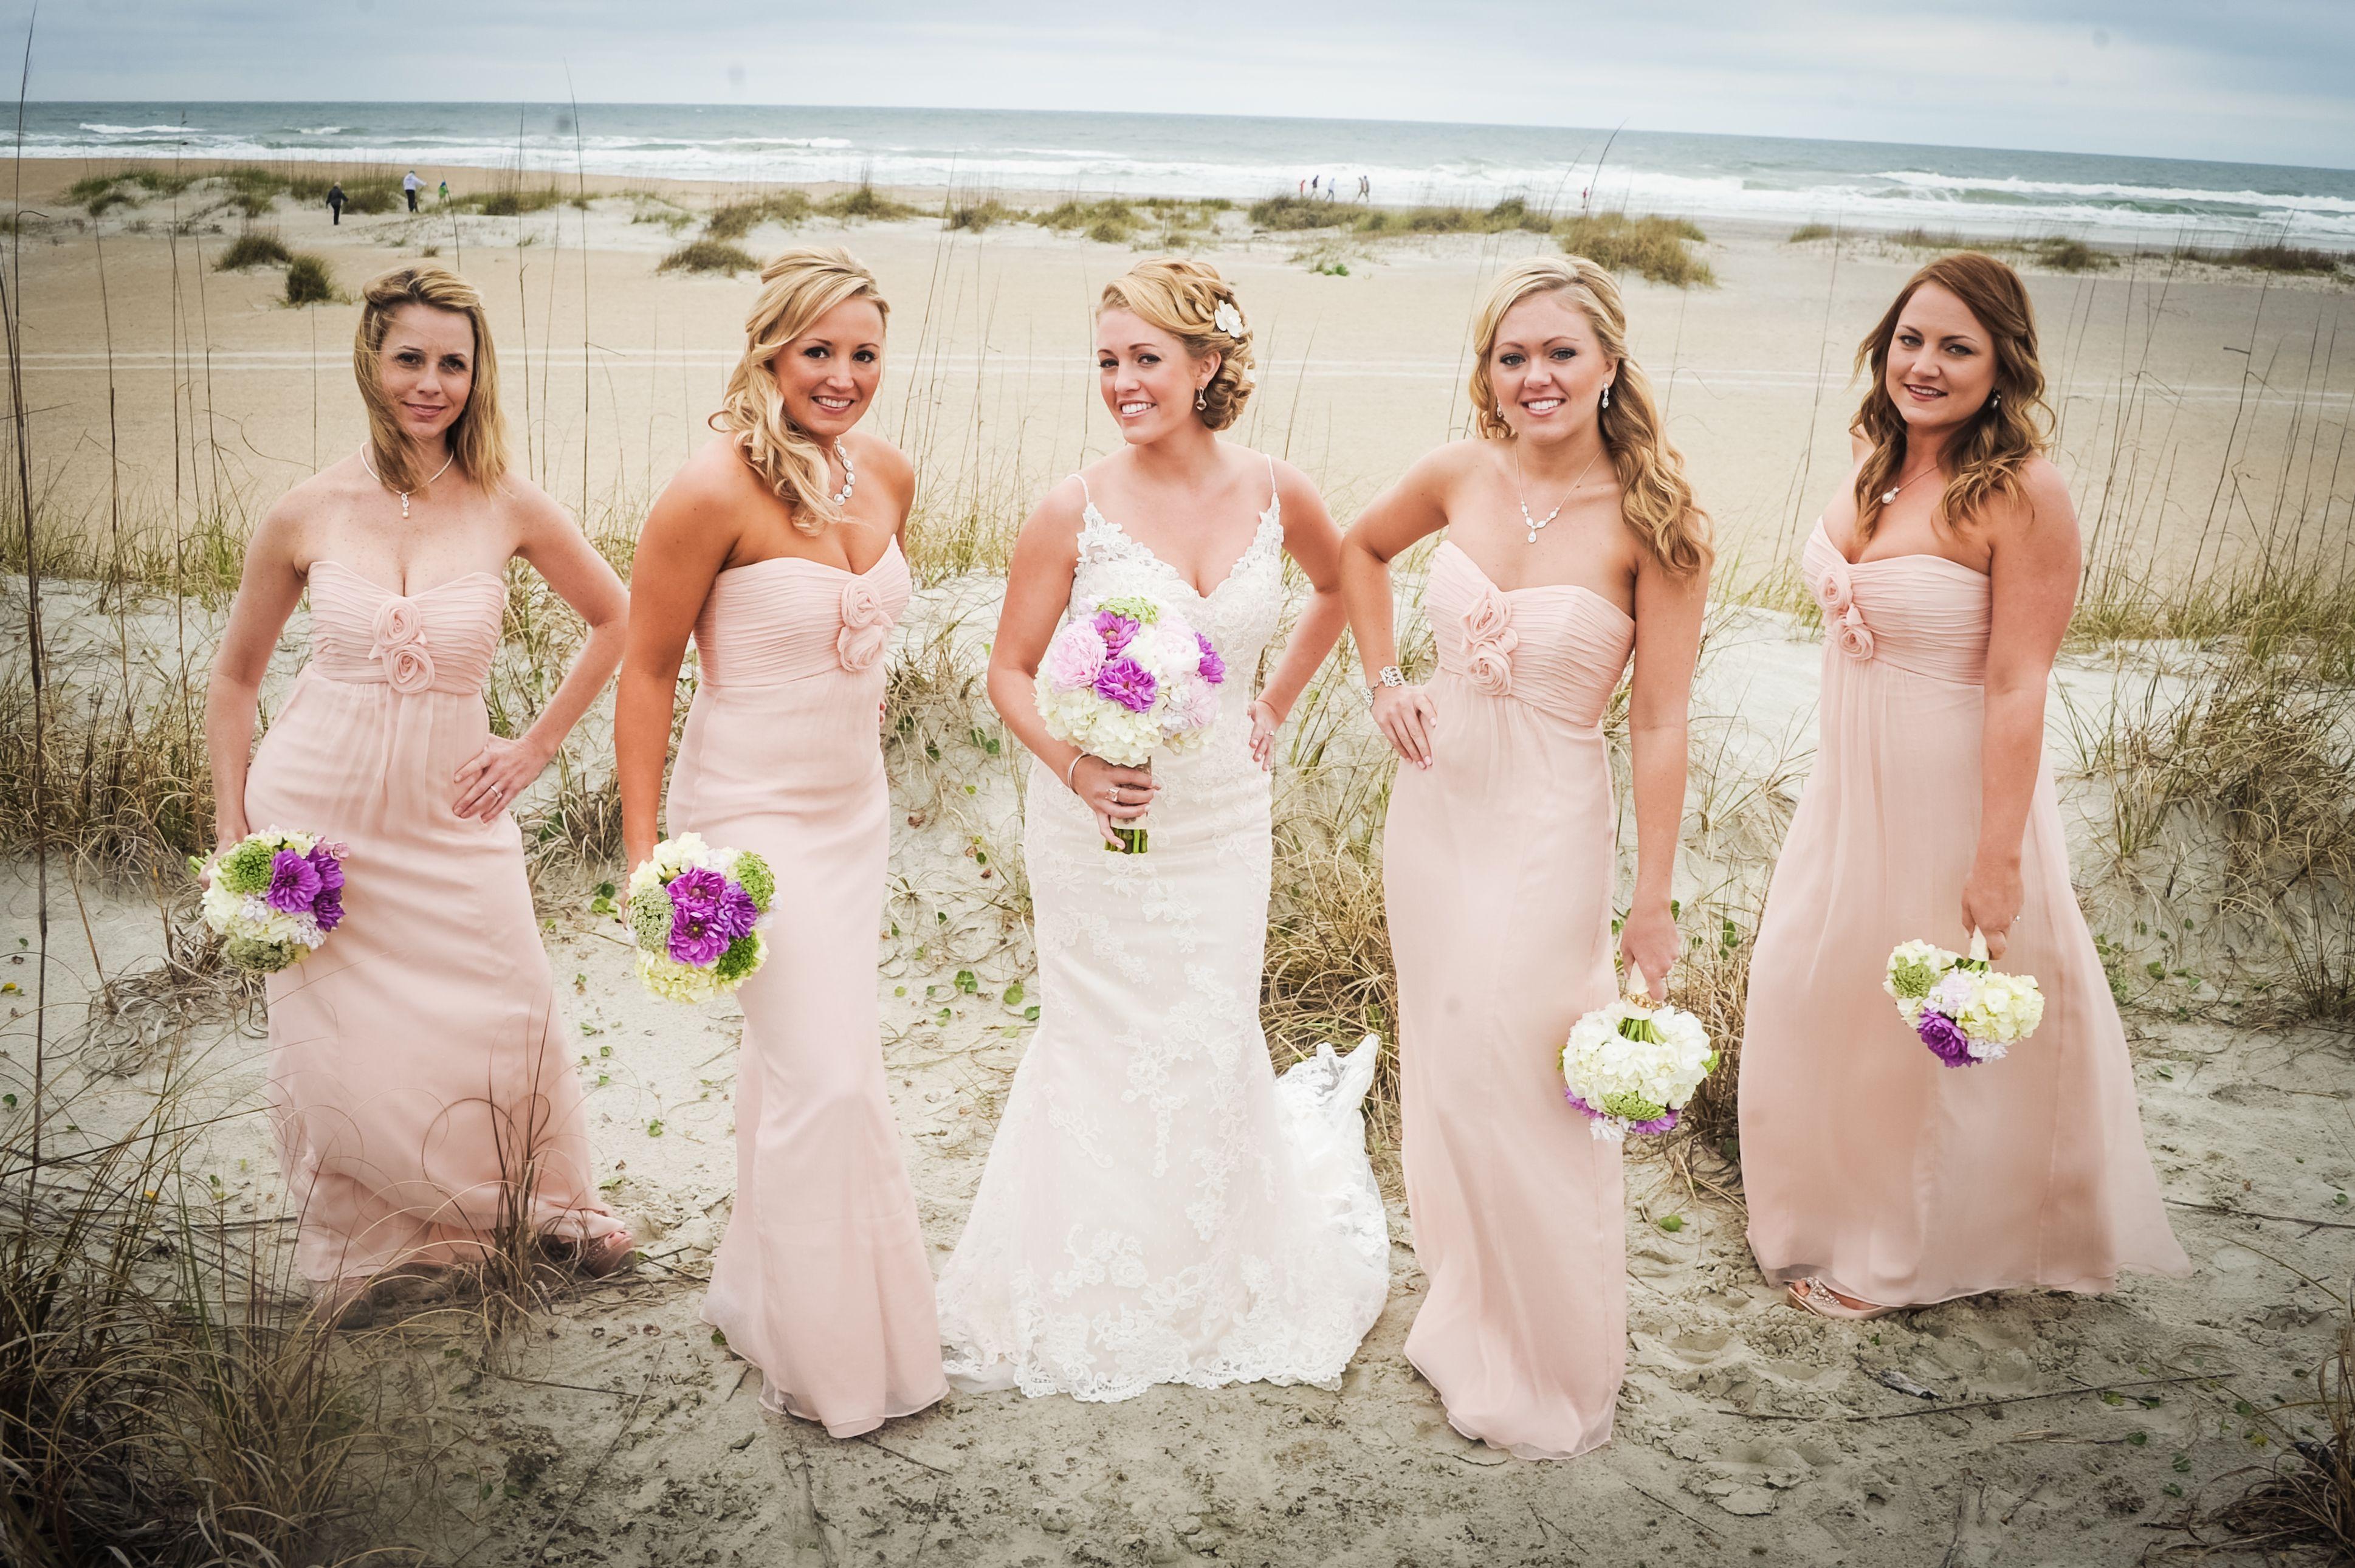 Pale pink amsale bridesmaids dresses beach wedding weddings pale pink amsale bridesmaids dresses beach wedding ombrellifo Gallery